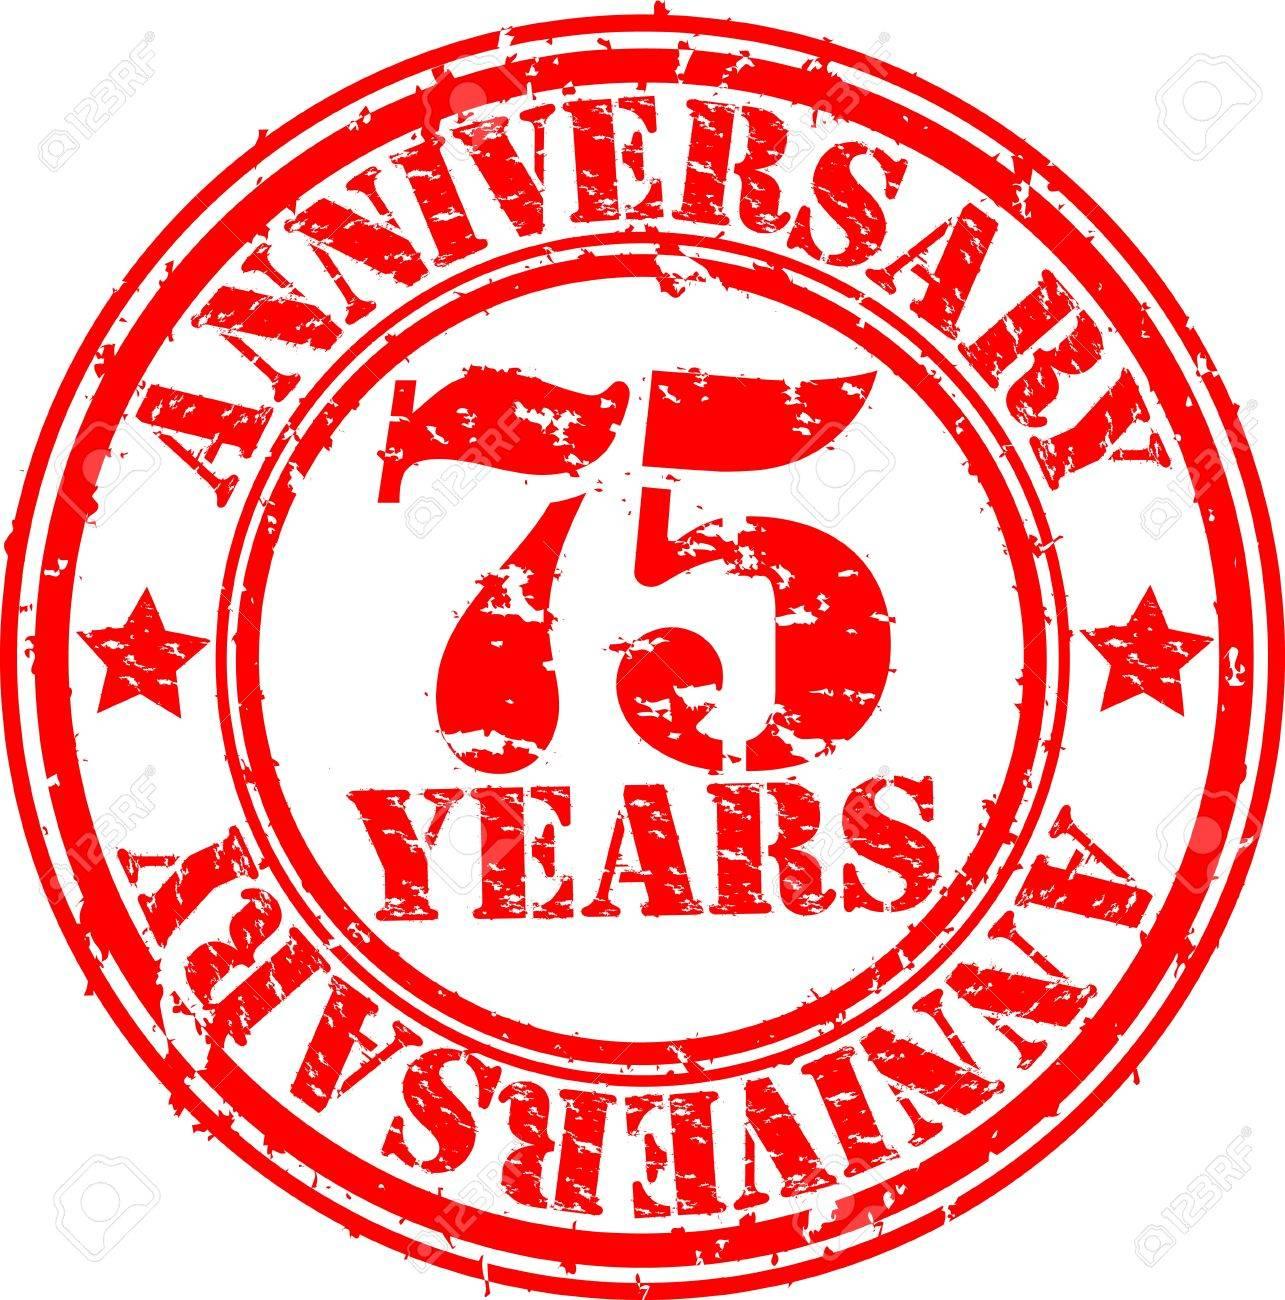 Grunge 75 years happy birthday rubber stamp, illustration Stock Vector - 16184220